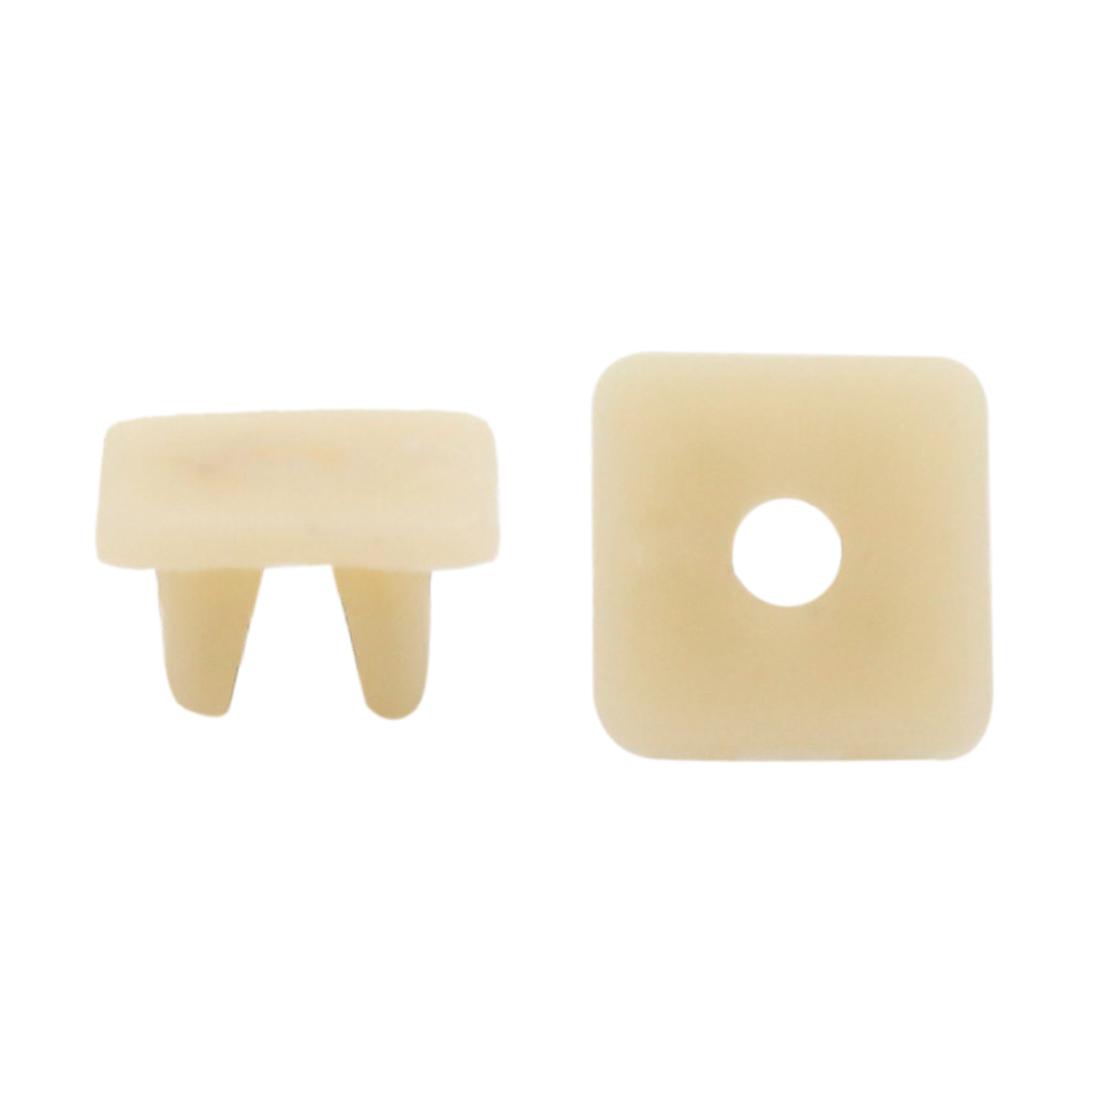 50pcs 9 x 8mm Hole Beige Plastic Rivets Fastener Push Clips for Car Auto Fender